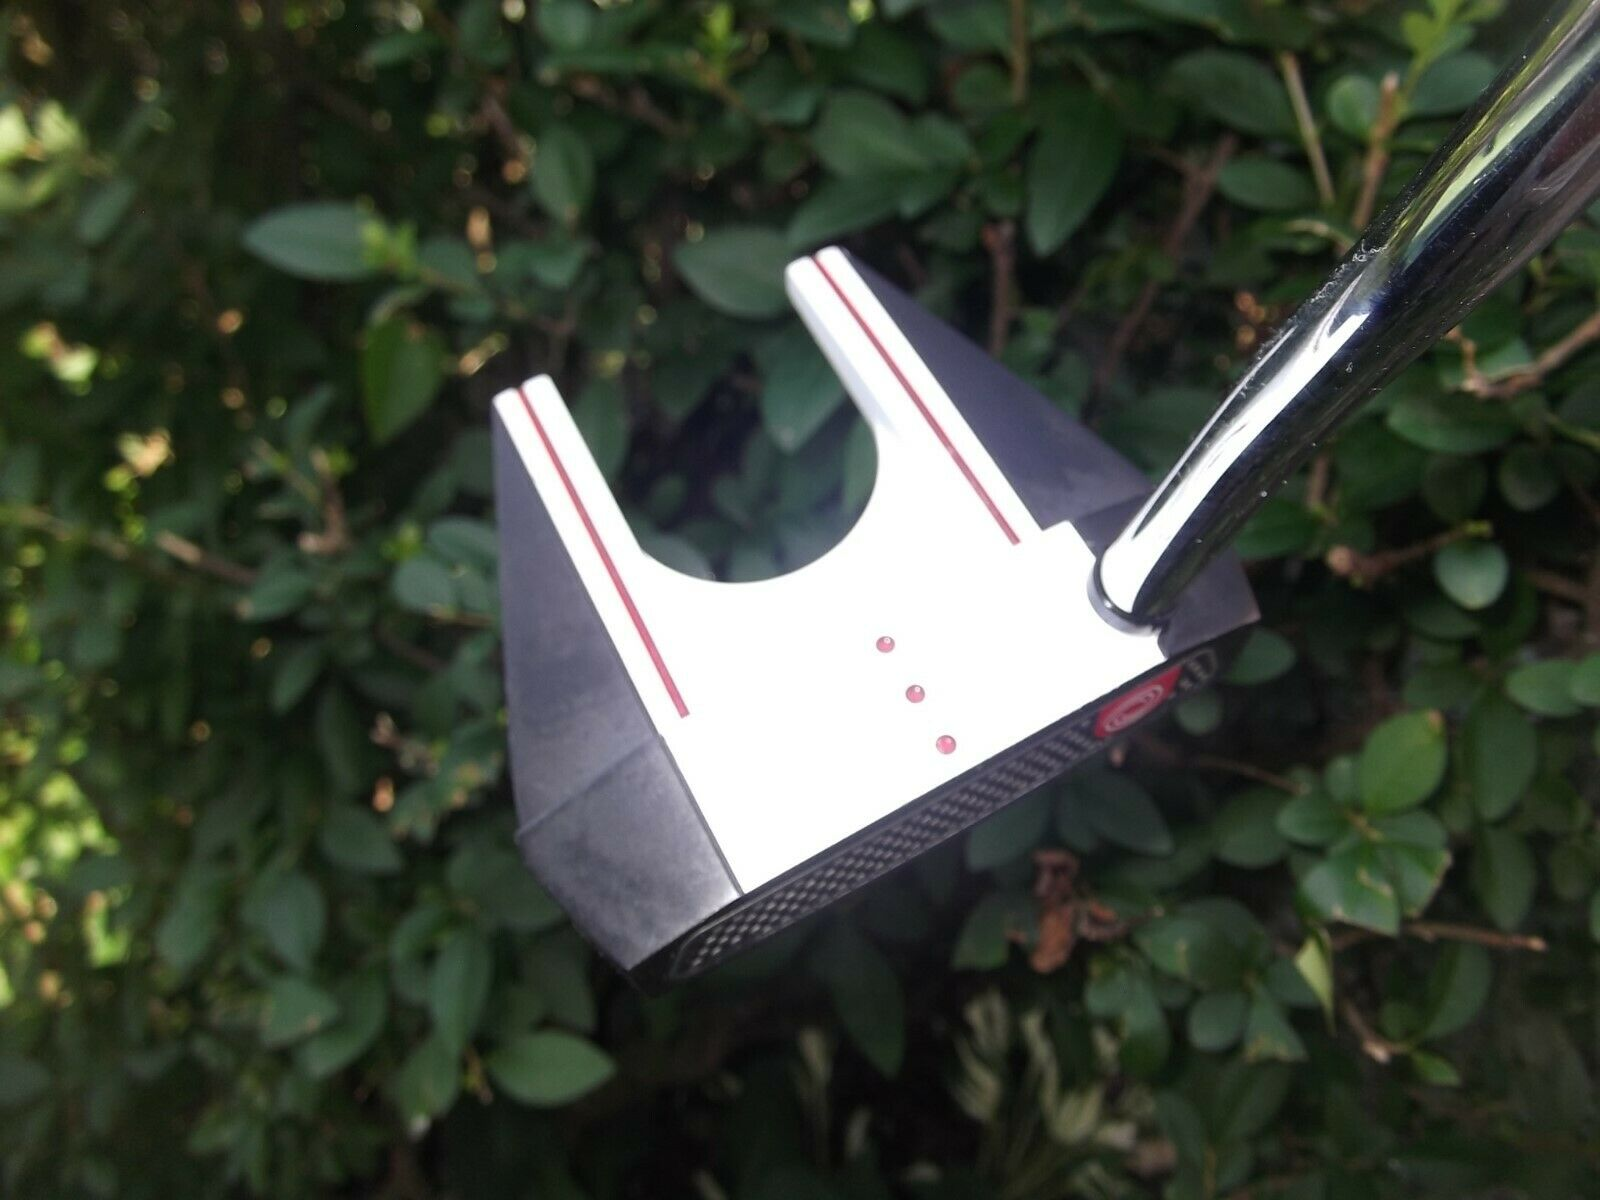 Nuevo viejo stock-Mano Derecha-Odisea o Works  7 - 35-Winn AVS de tamaño mediano Pistol Grip-Excelente  bajo precio